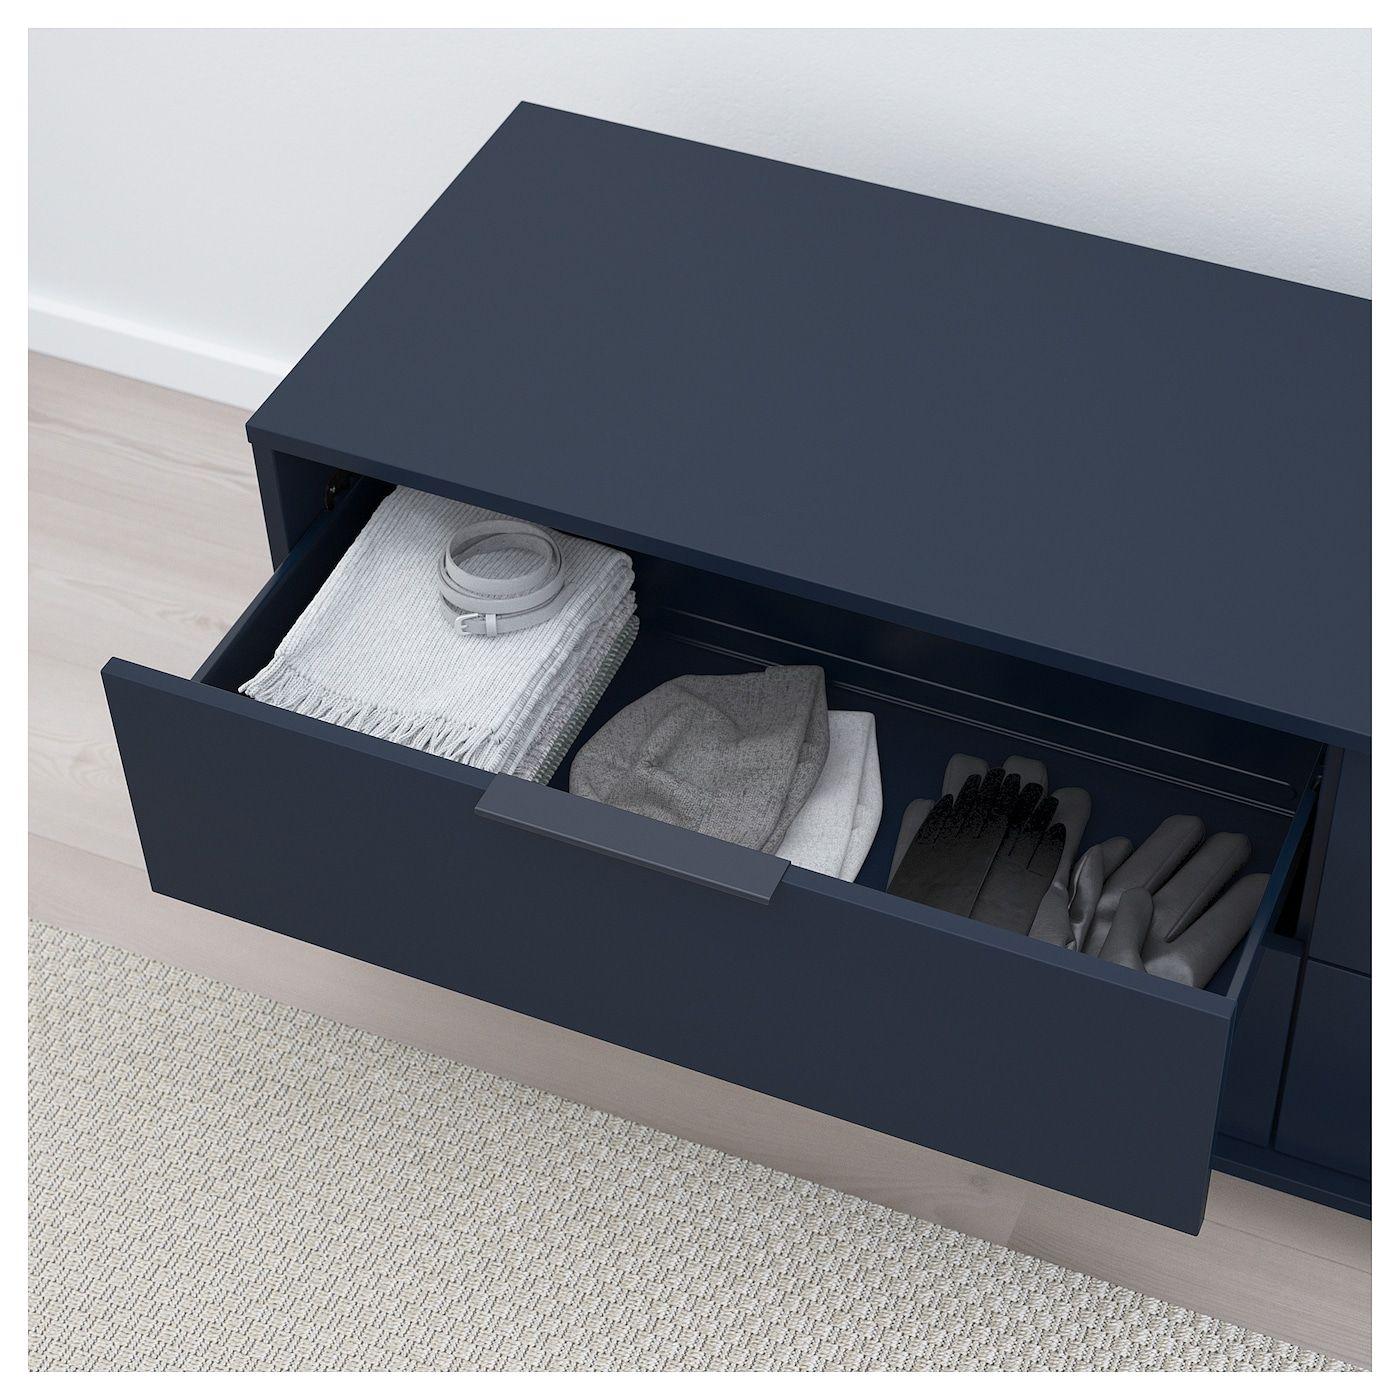 Nordmela Ladekast Met 4 Lades Zwartblauw 159x50 Cm Ikea In